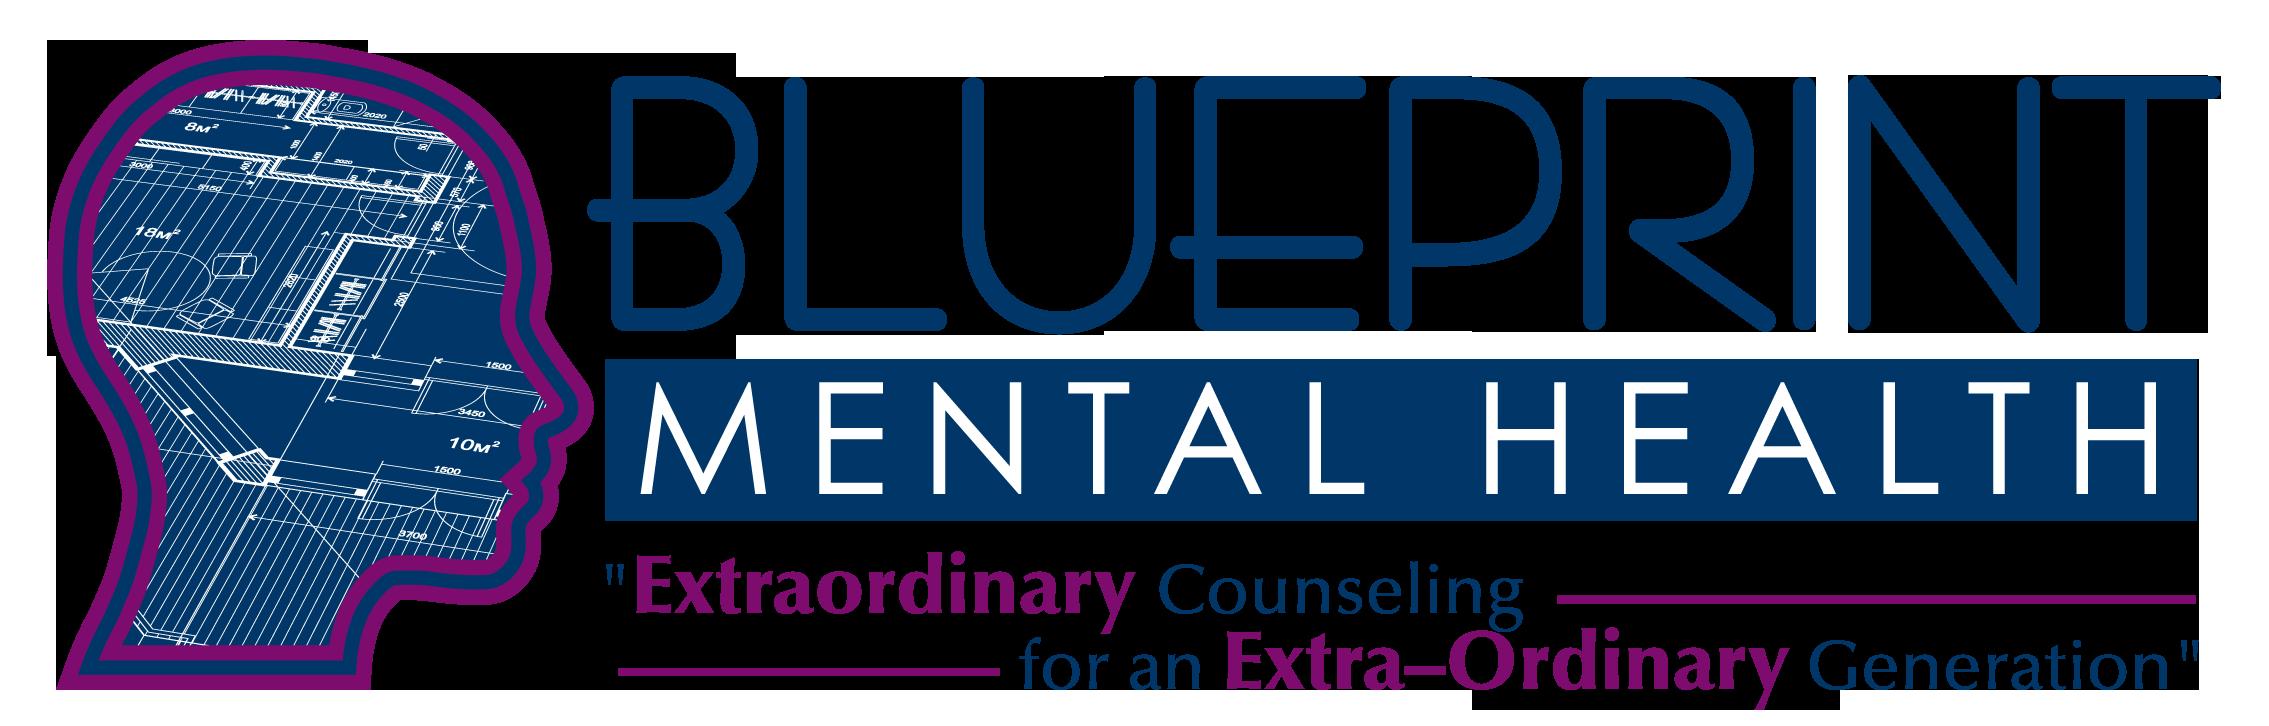 Blueprint mental health